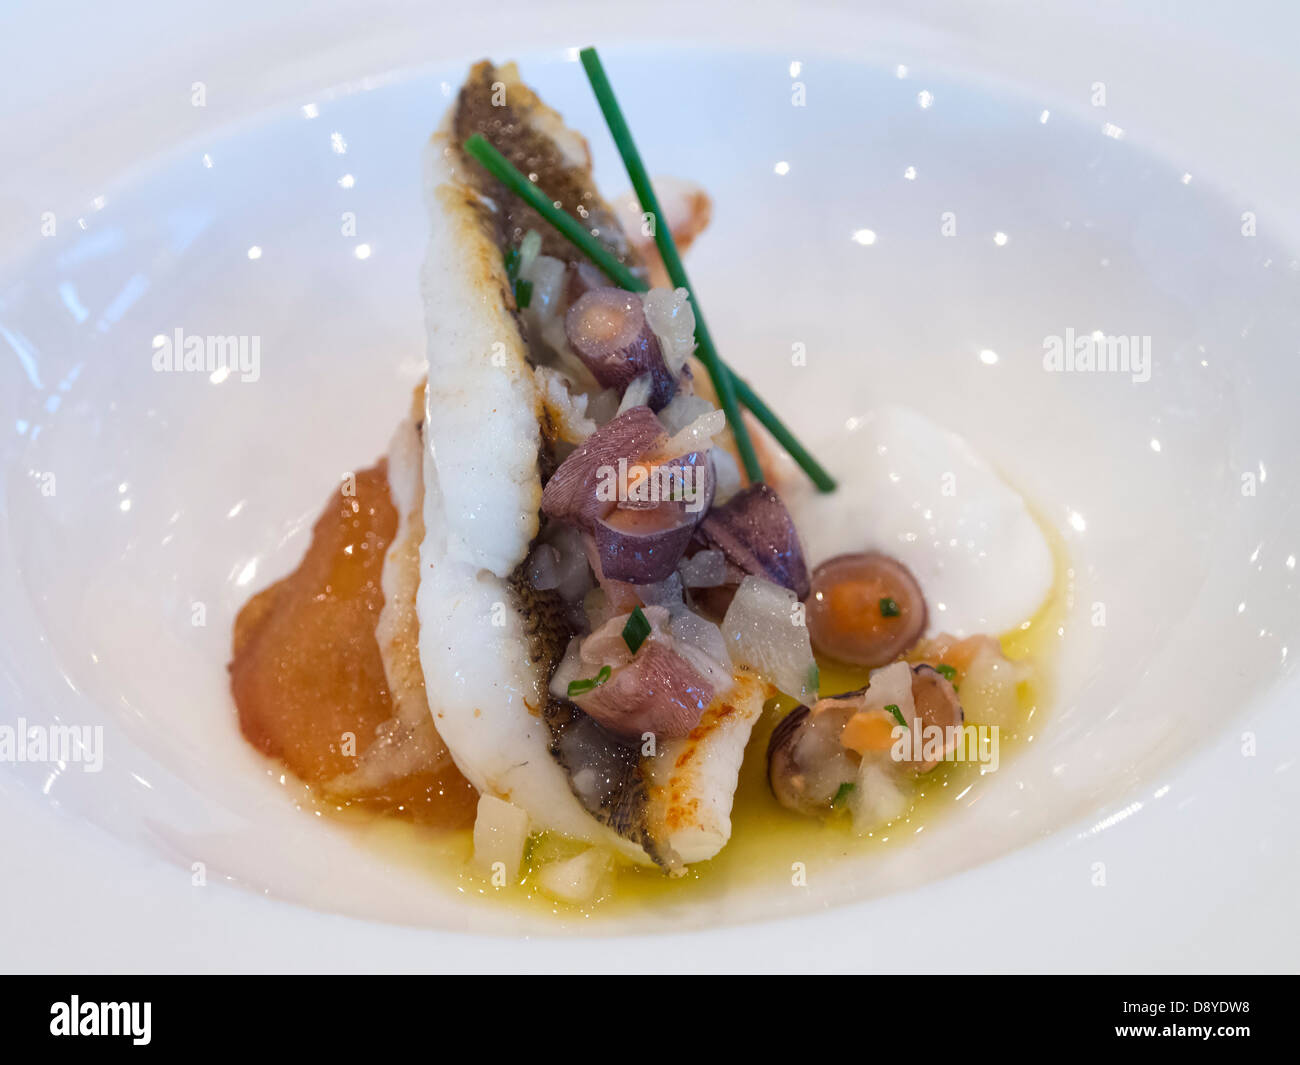 Nouvelle cuisine gourmet seafood dish stock photo for Nouvelle cuisine